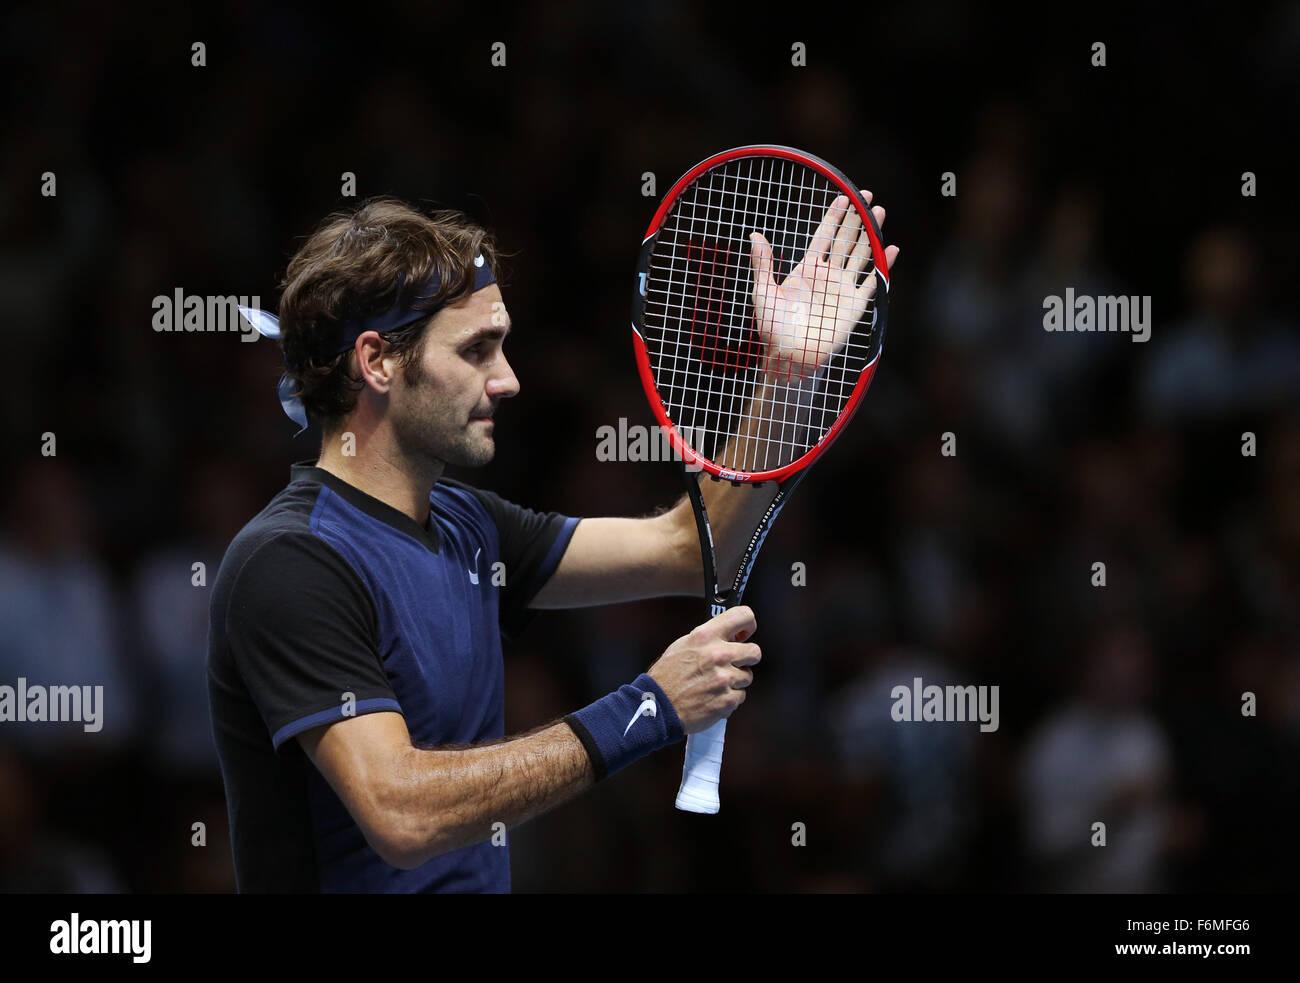 London, UK. 17th Nov, 2015. Roger Federer of Switzerland celebrates after the match against Novak Djokovic of Serbia Stock Photo